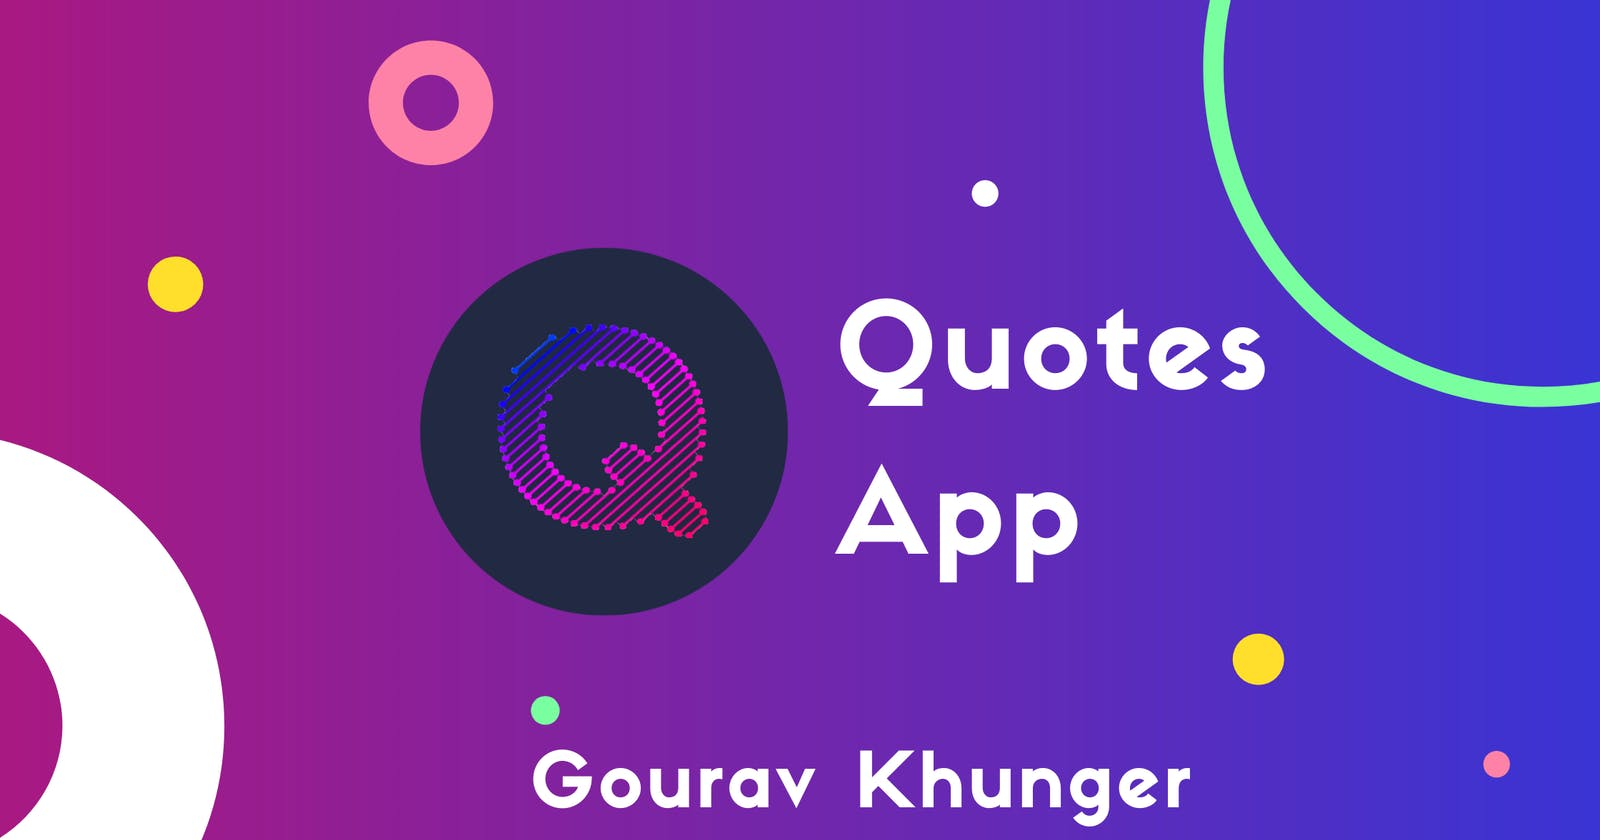 Introducing Quotes App